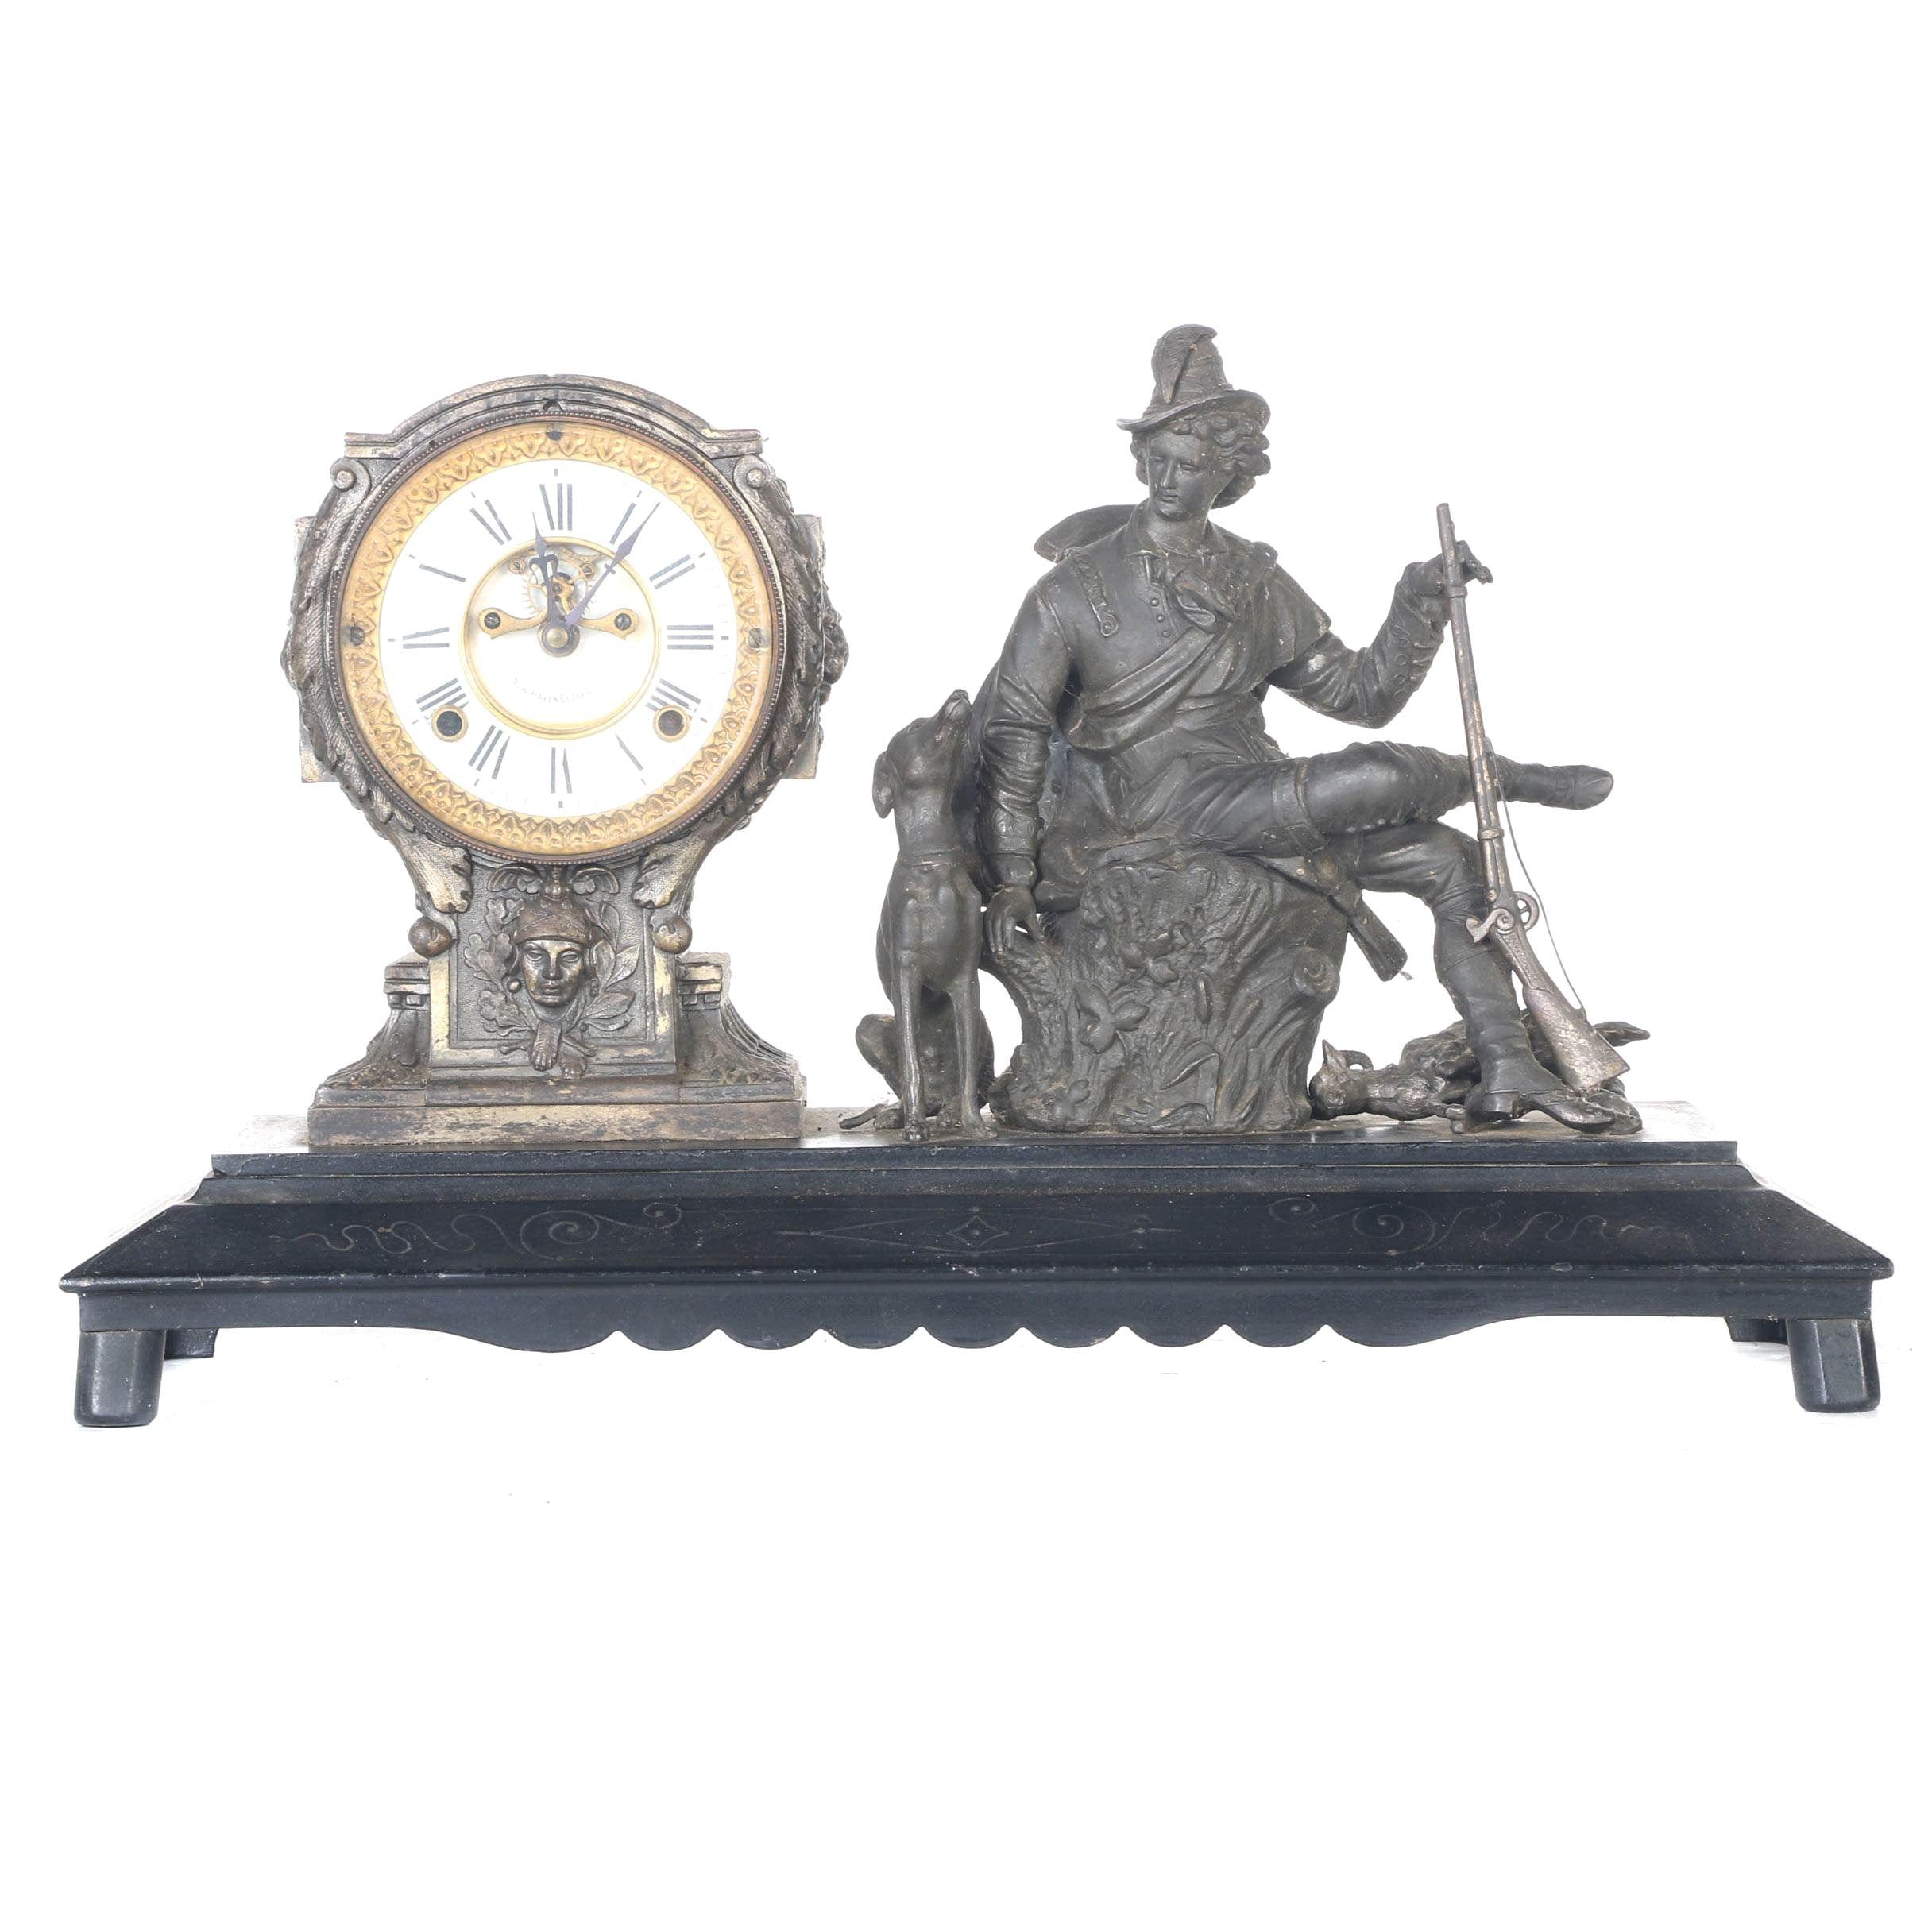 New Haven Clock Co. Hunting Mantel Clock